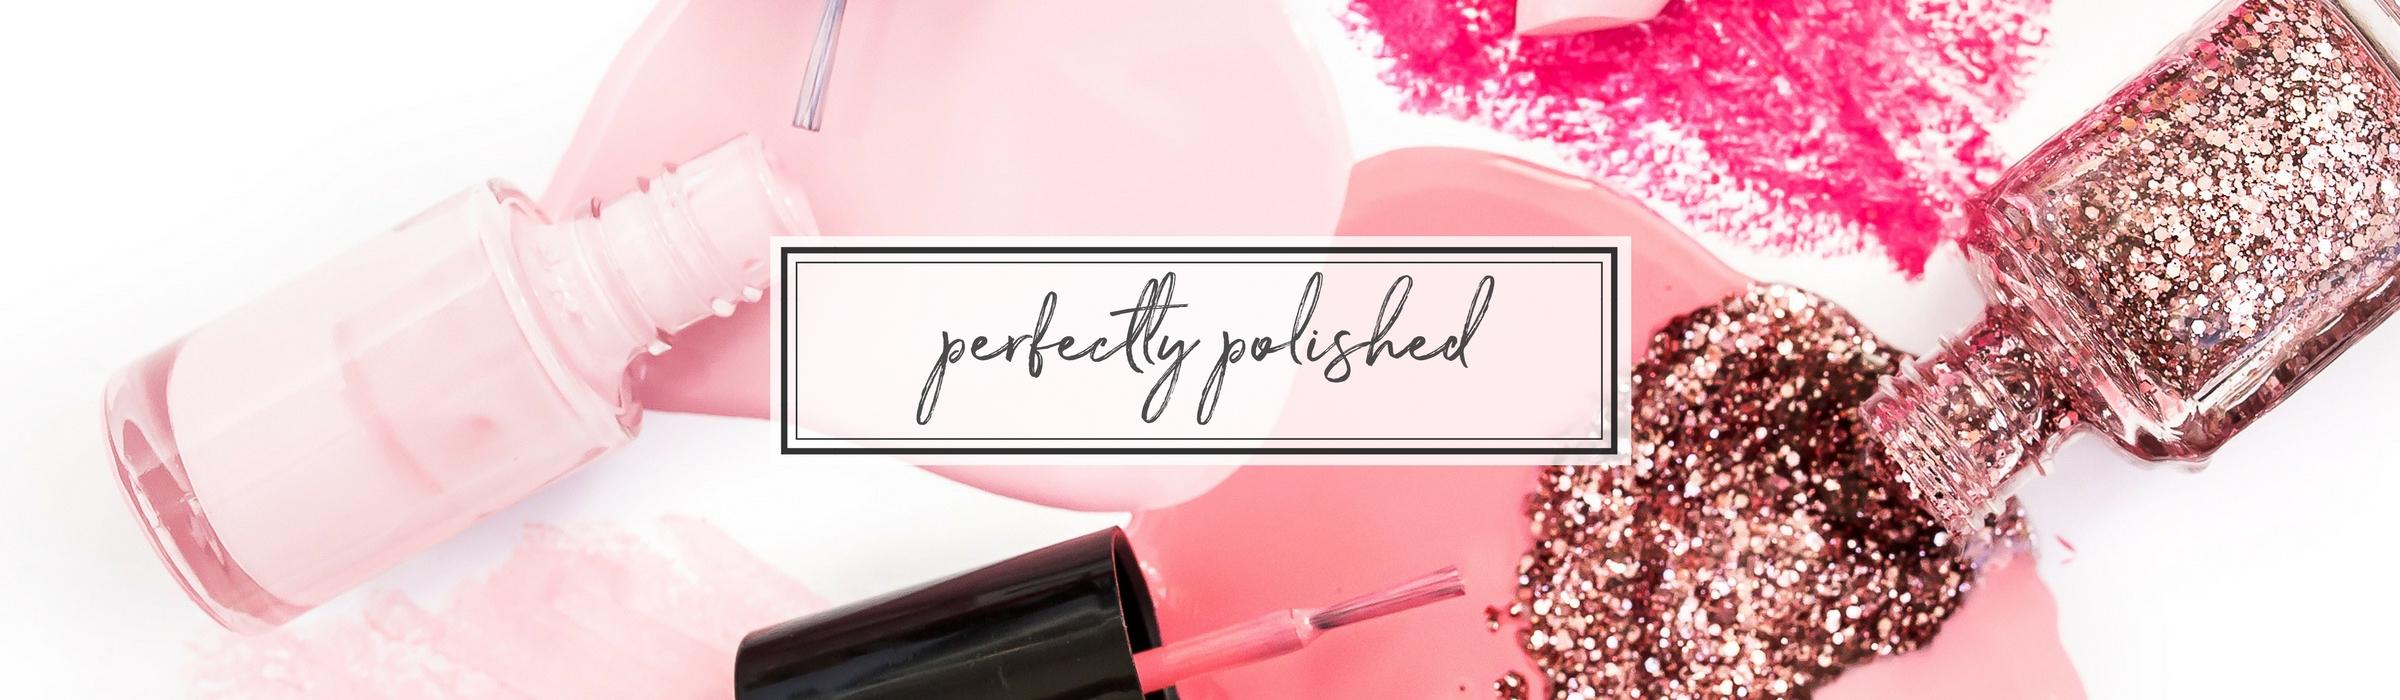 perfectly polished